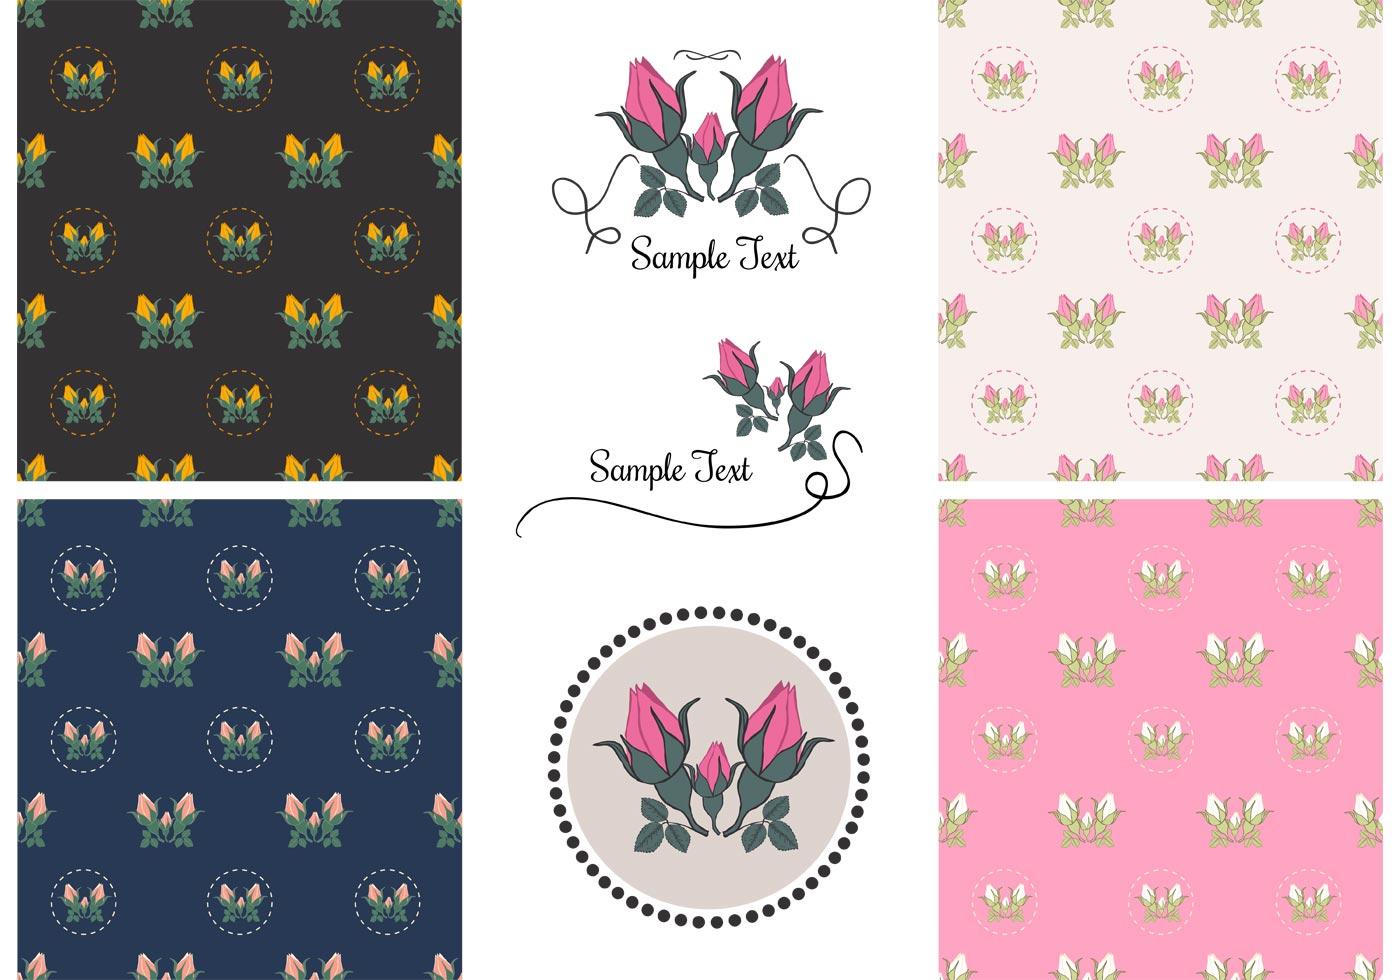 Free Vector Vintage Rose Patterns - Download Free Vector ...